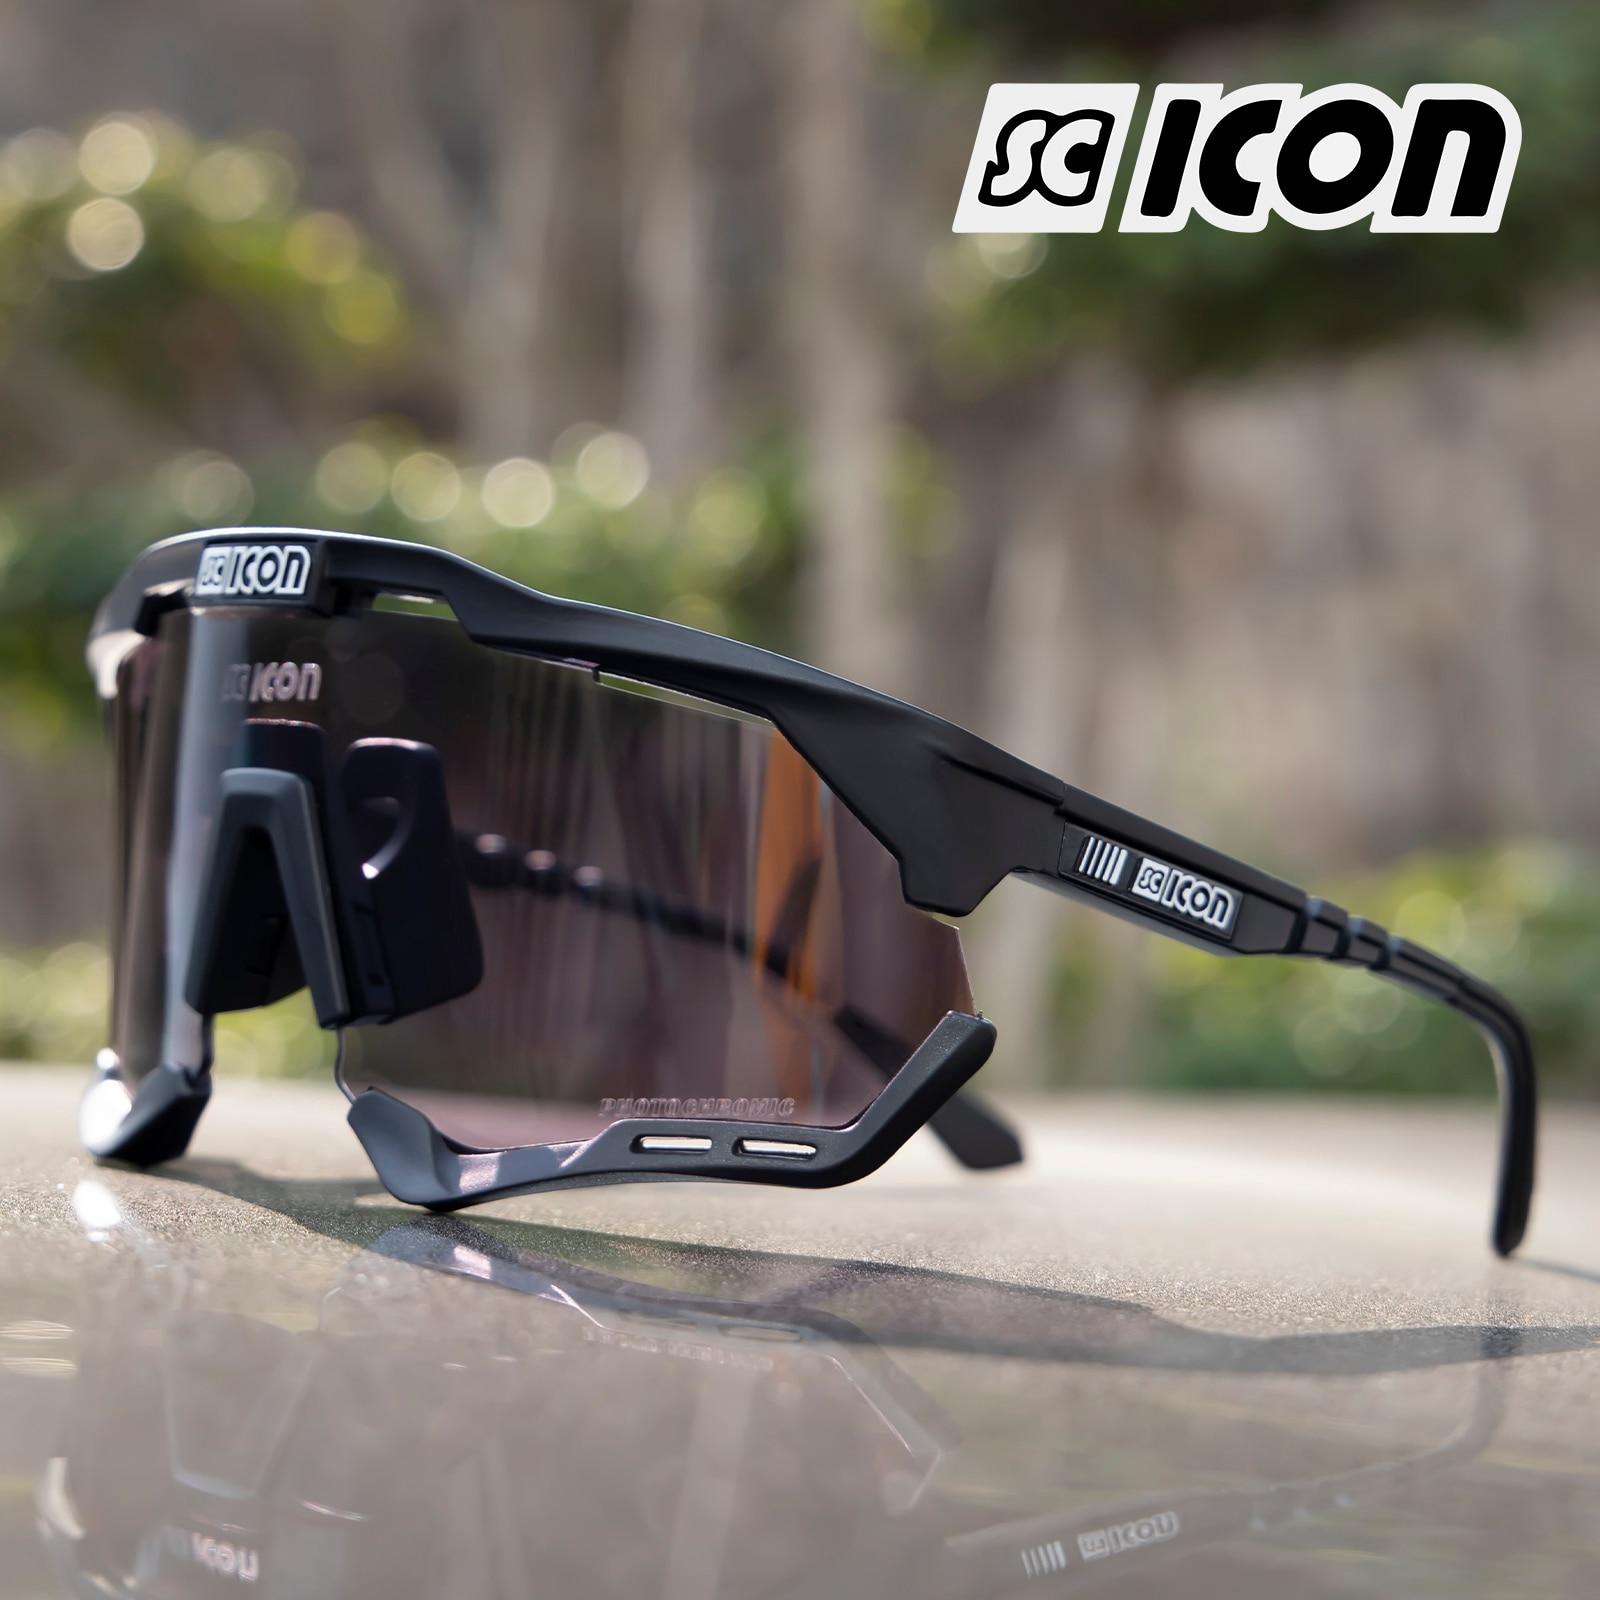 SCICON Photochromic Cycling Sunglasses 남자 여자 Mtb 스포츠 UV400 옥외 고글 자전거 산 달리기 자전거 안경 Eyewear